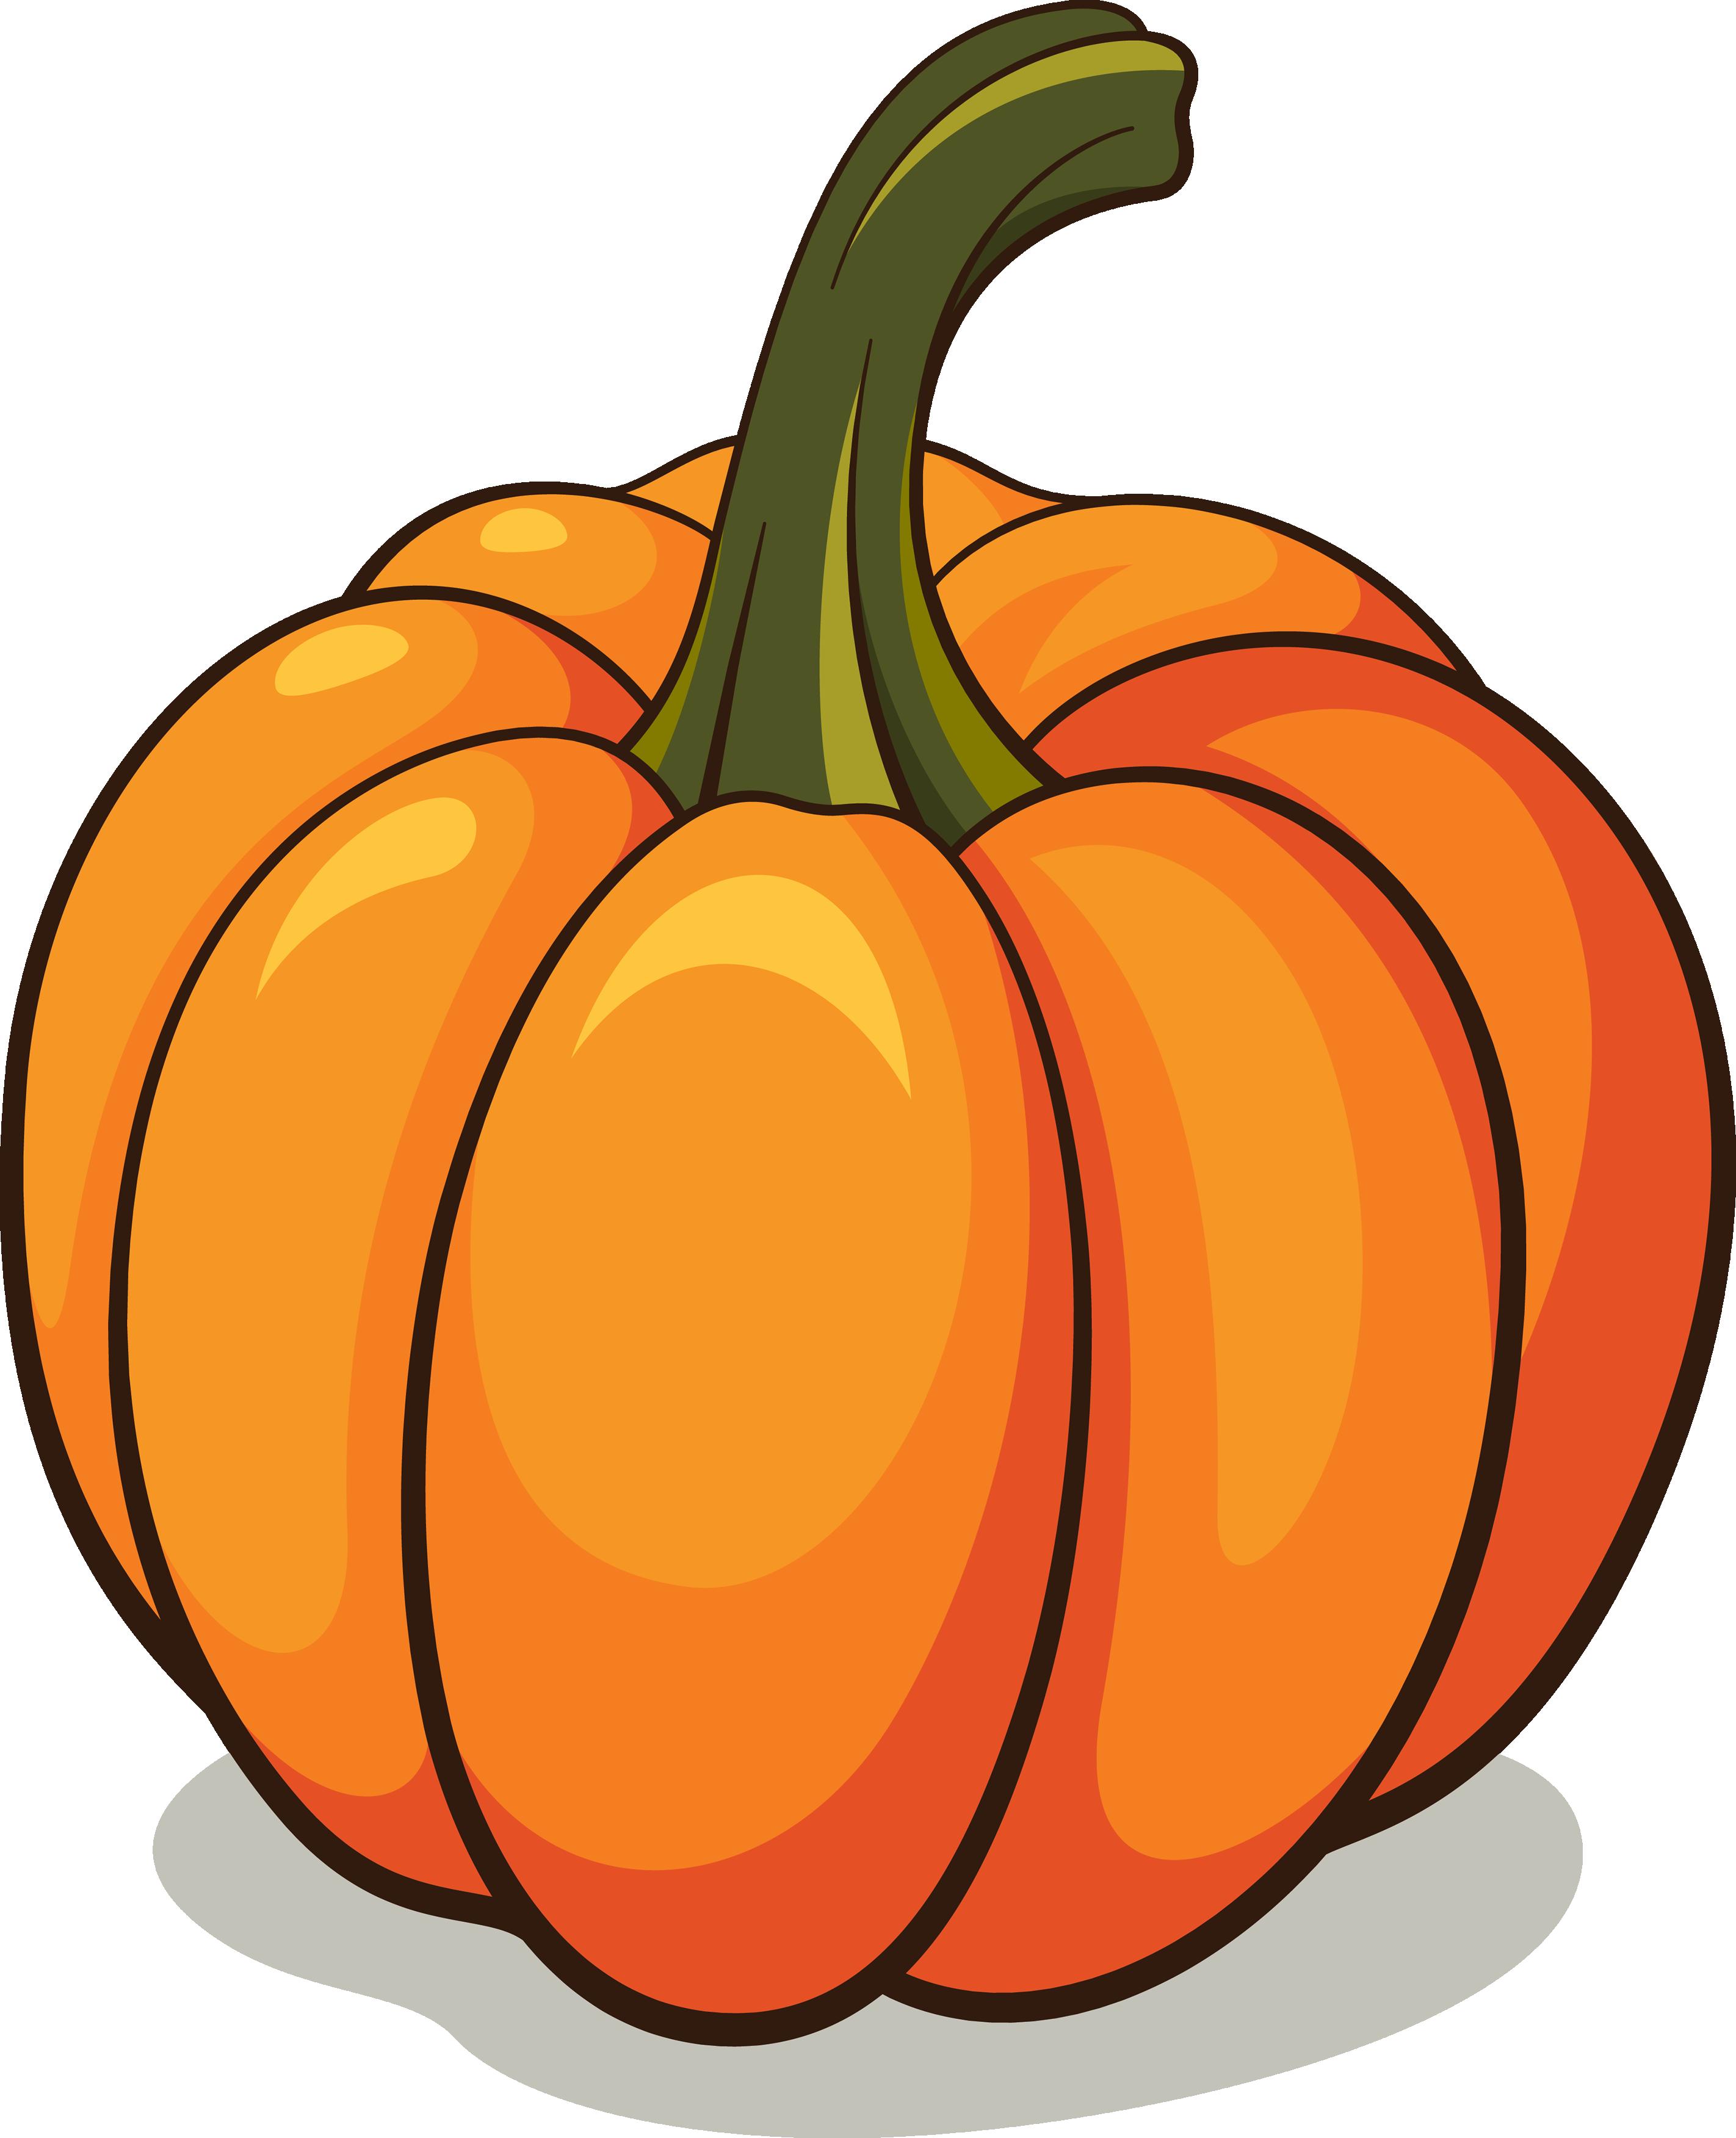 clip art royalty free library Chalk clipart pumpkin. Png pixels art lessons.